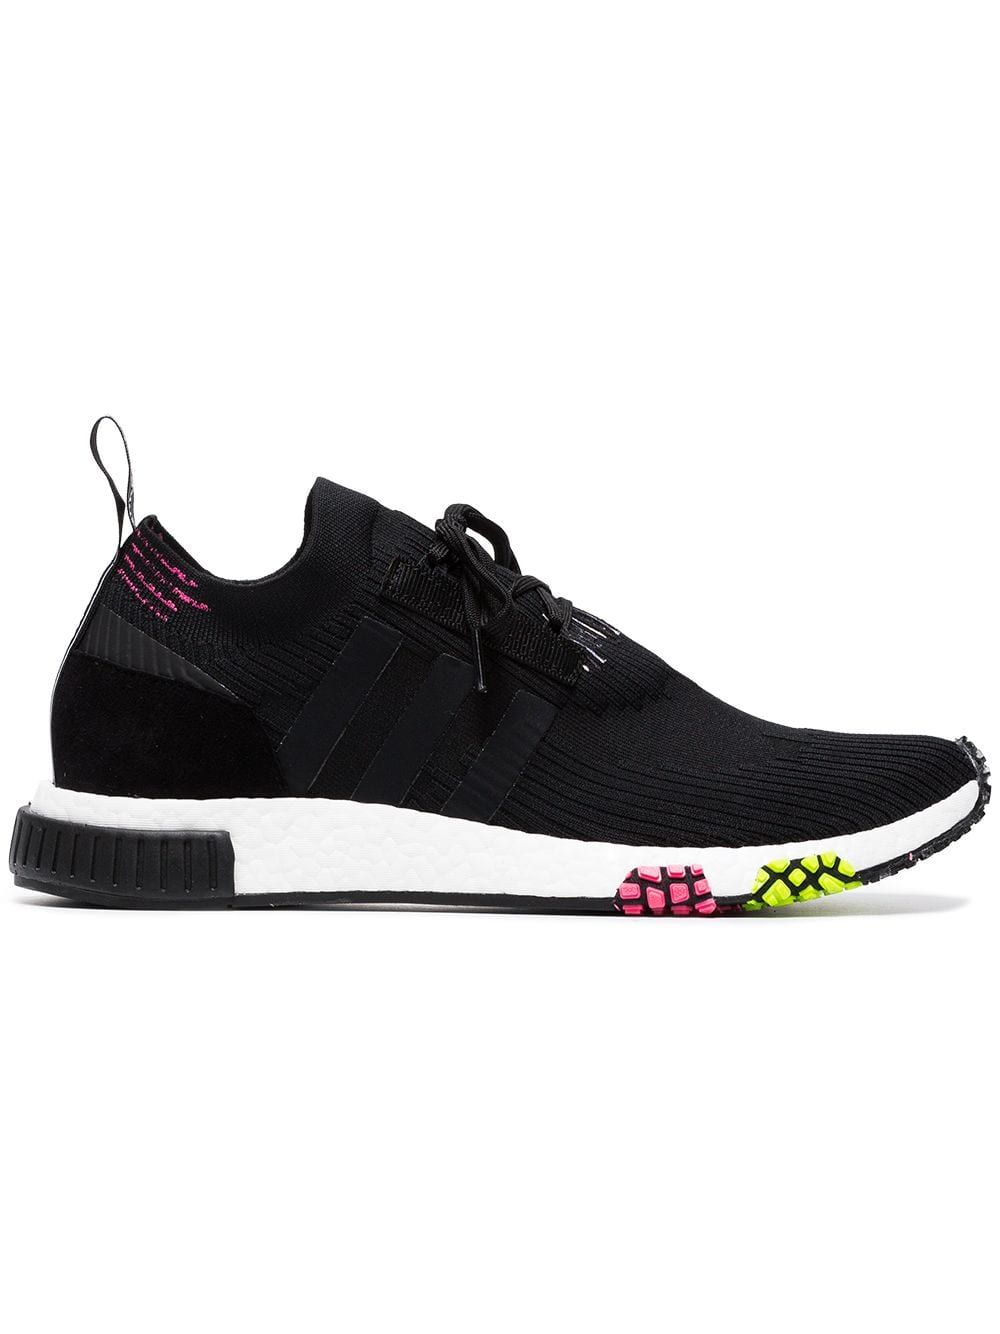 NMD Racer Primeknit sneakers | adidas |